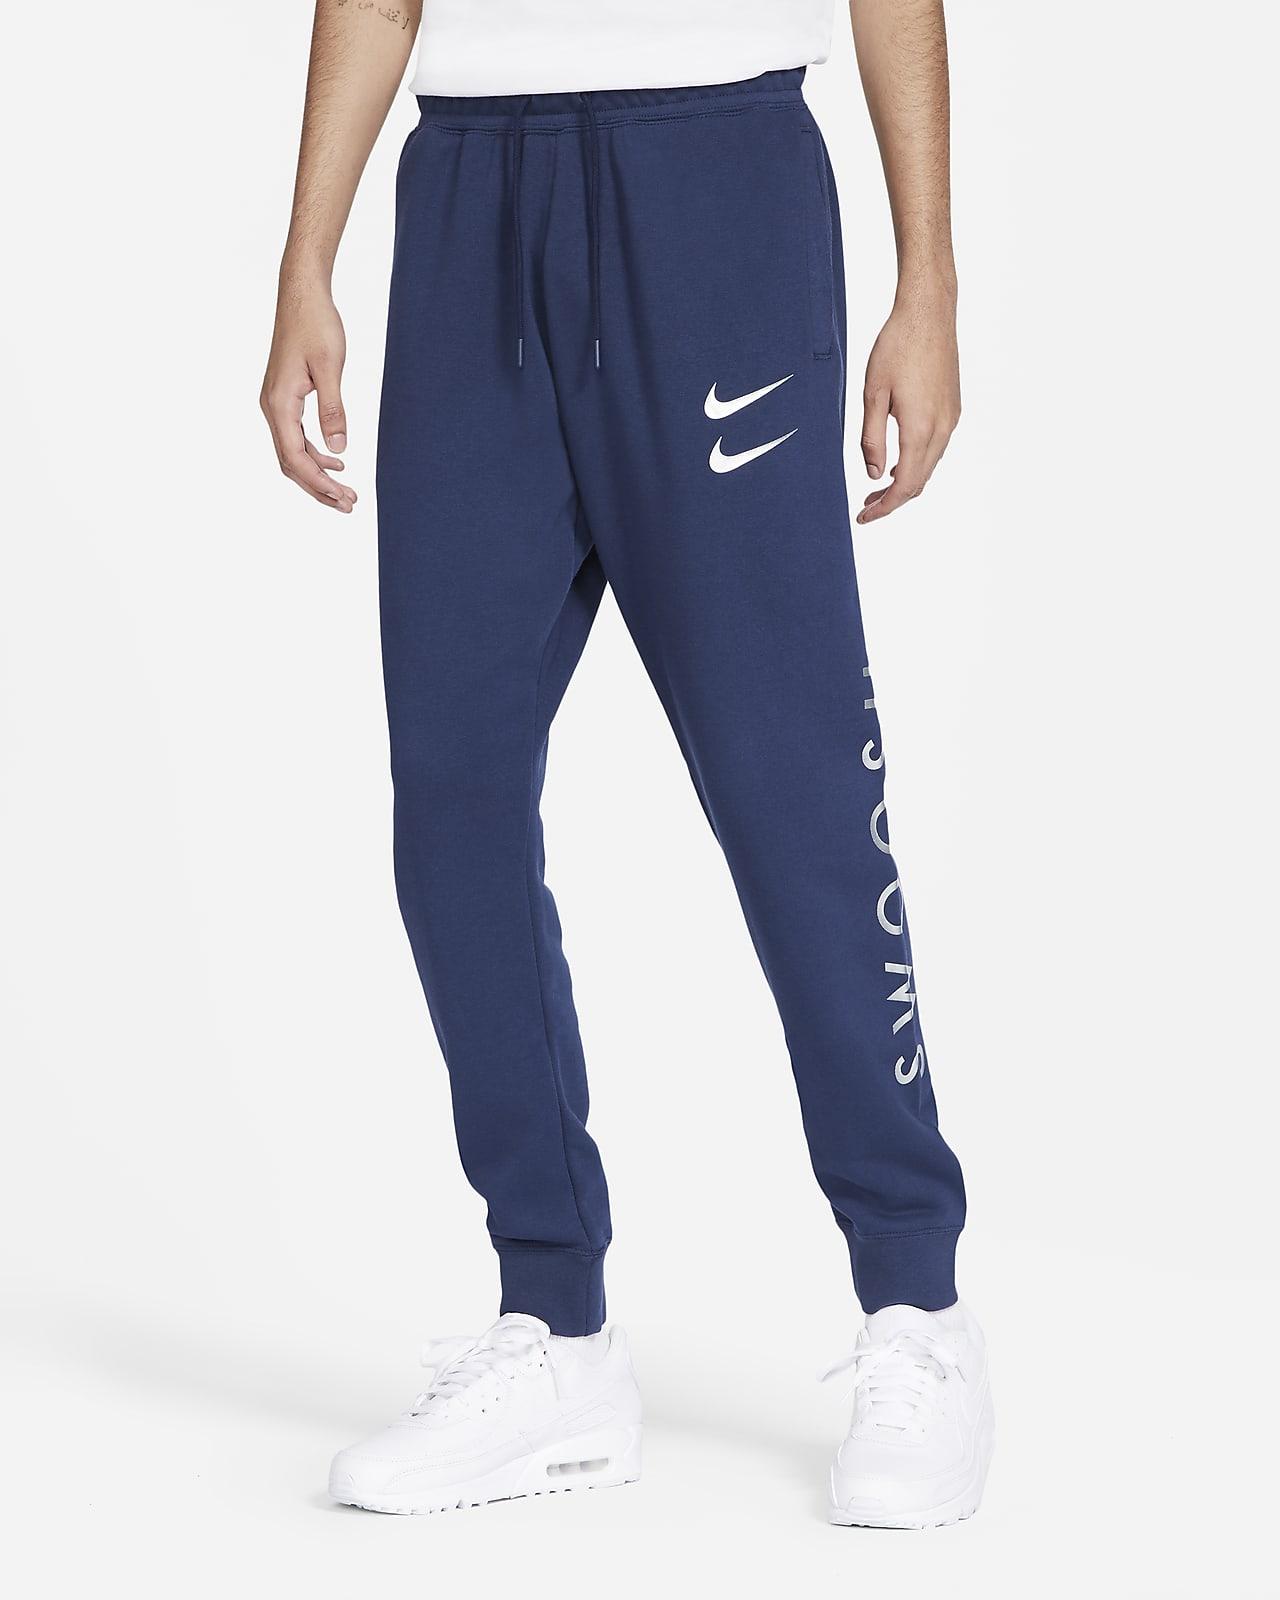 Byxor Nike Sportswear Swoosh för män